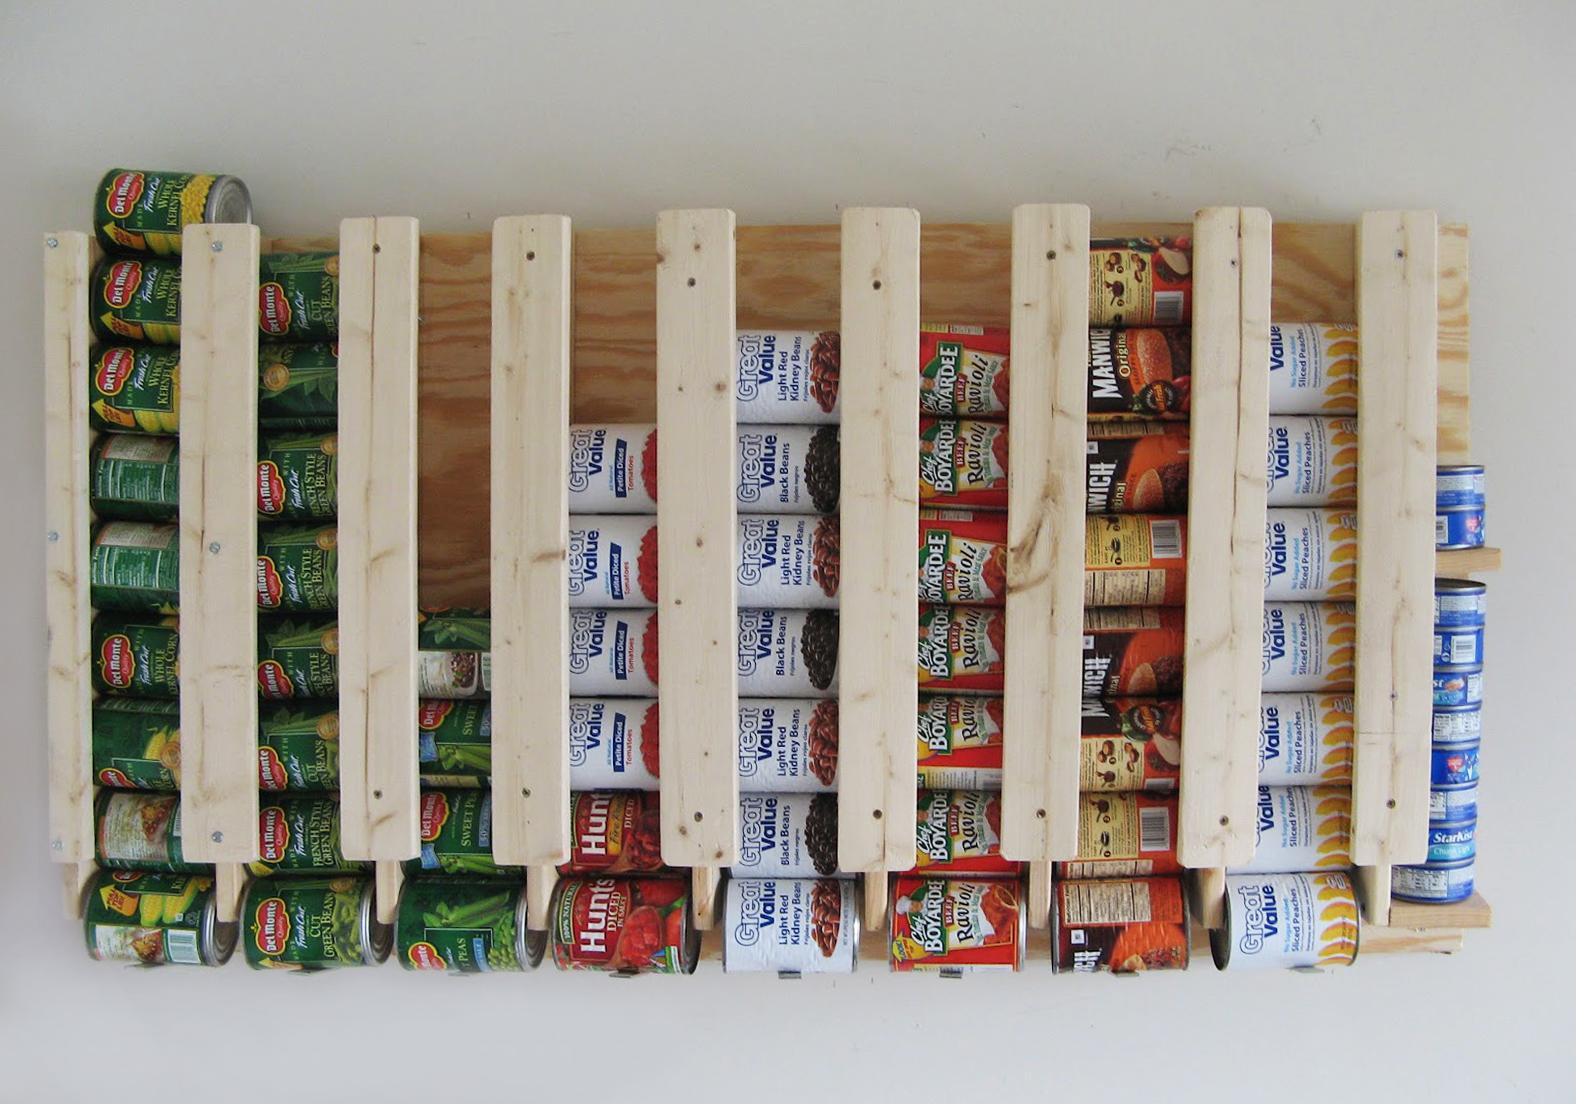 canned food storage fi